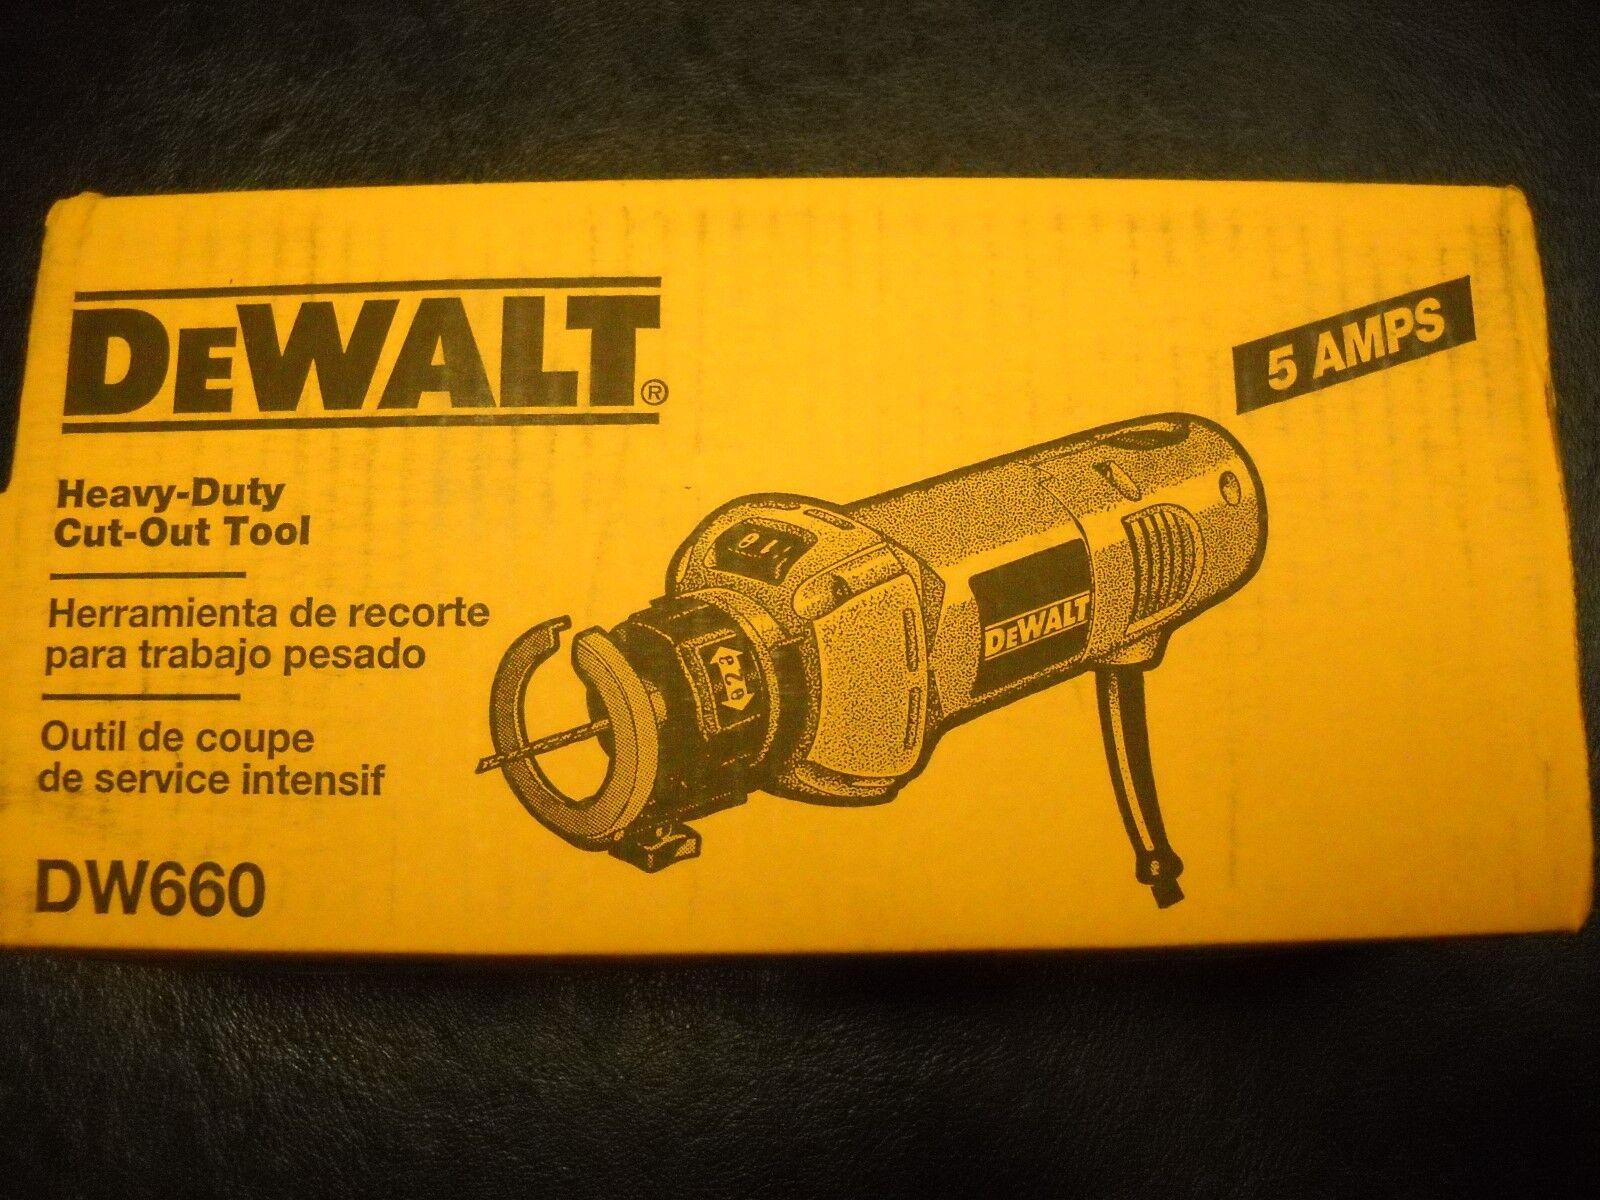 Dewalt DW660 5.0 Amp 30,000 RPM Cut-Out Tool